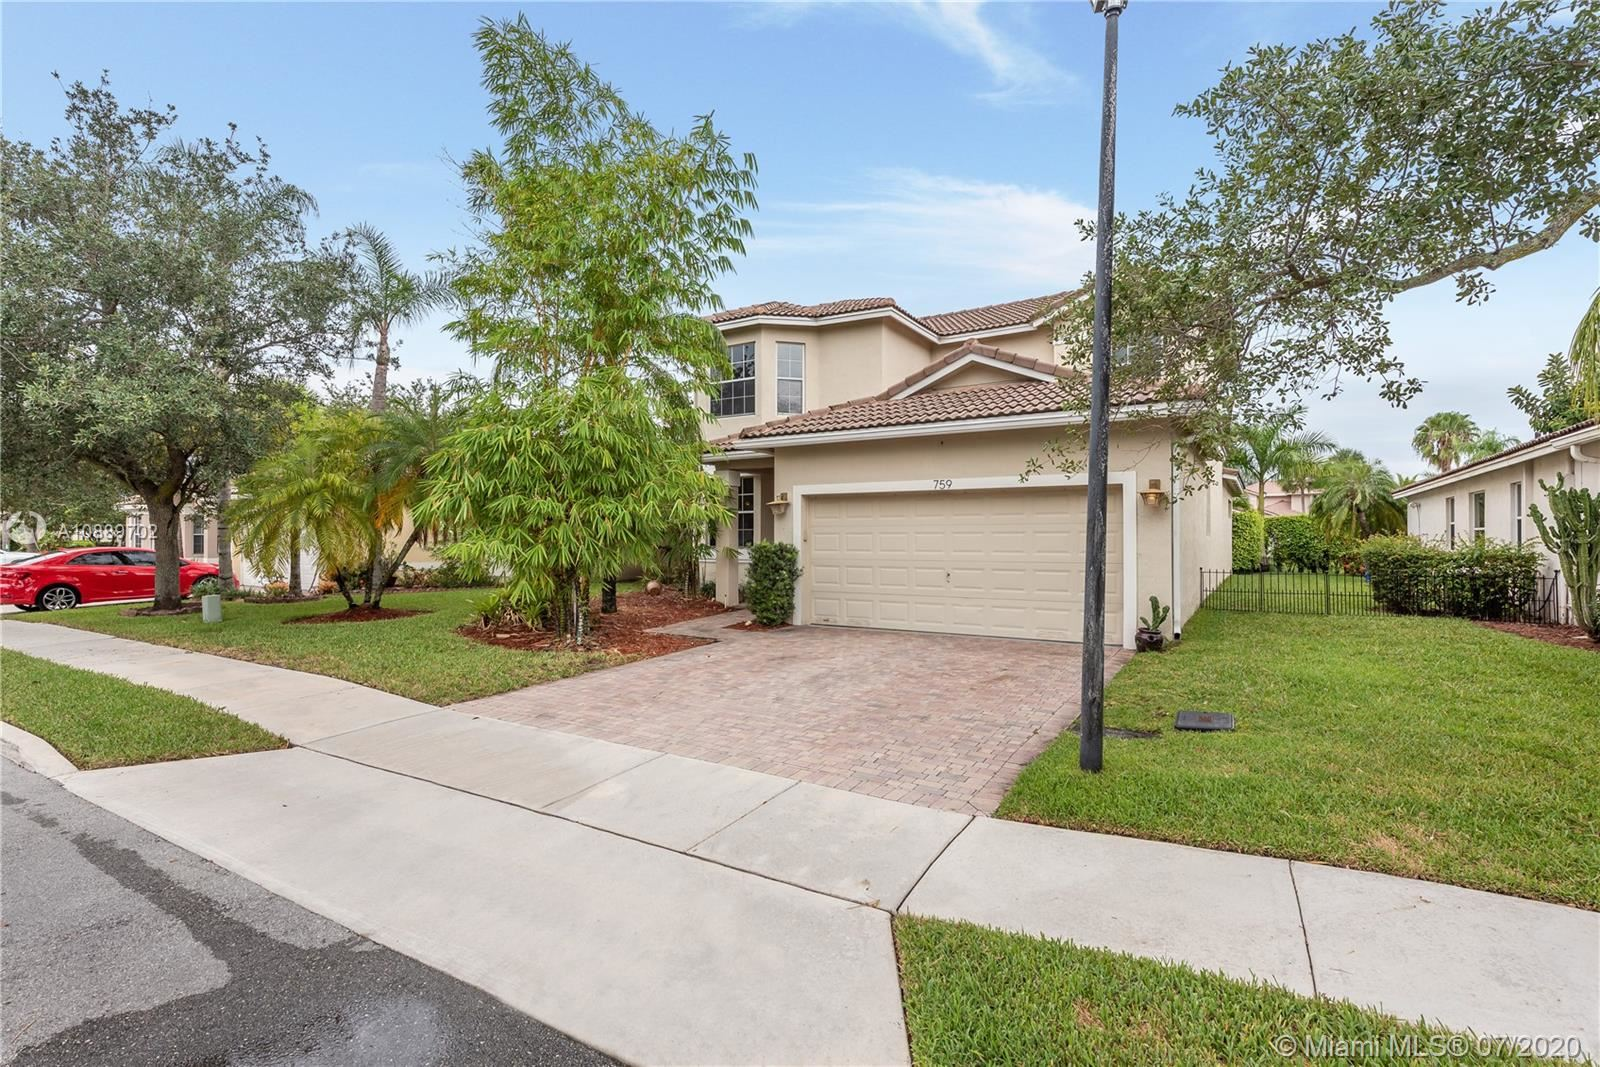 759 SW 121st Ave, Pembroke Pines, FL 33025 - #: A10889702